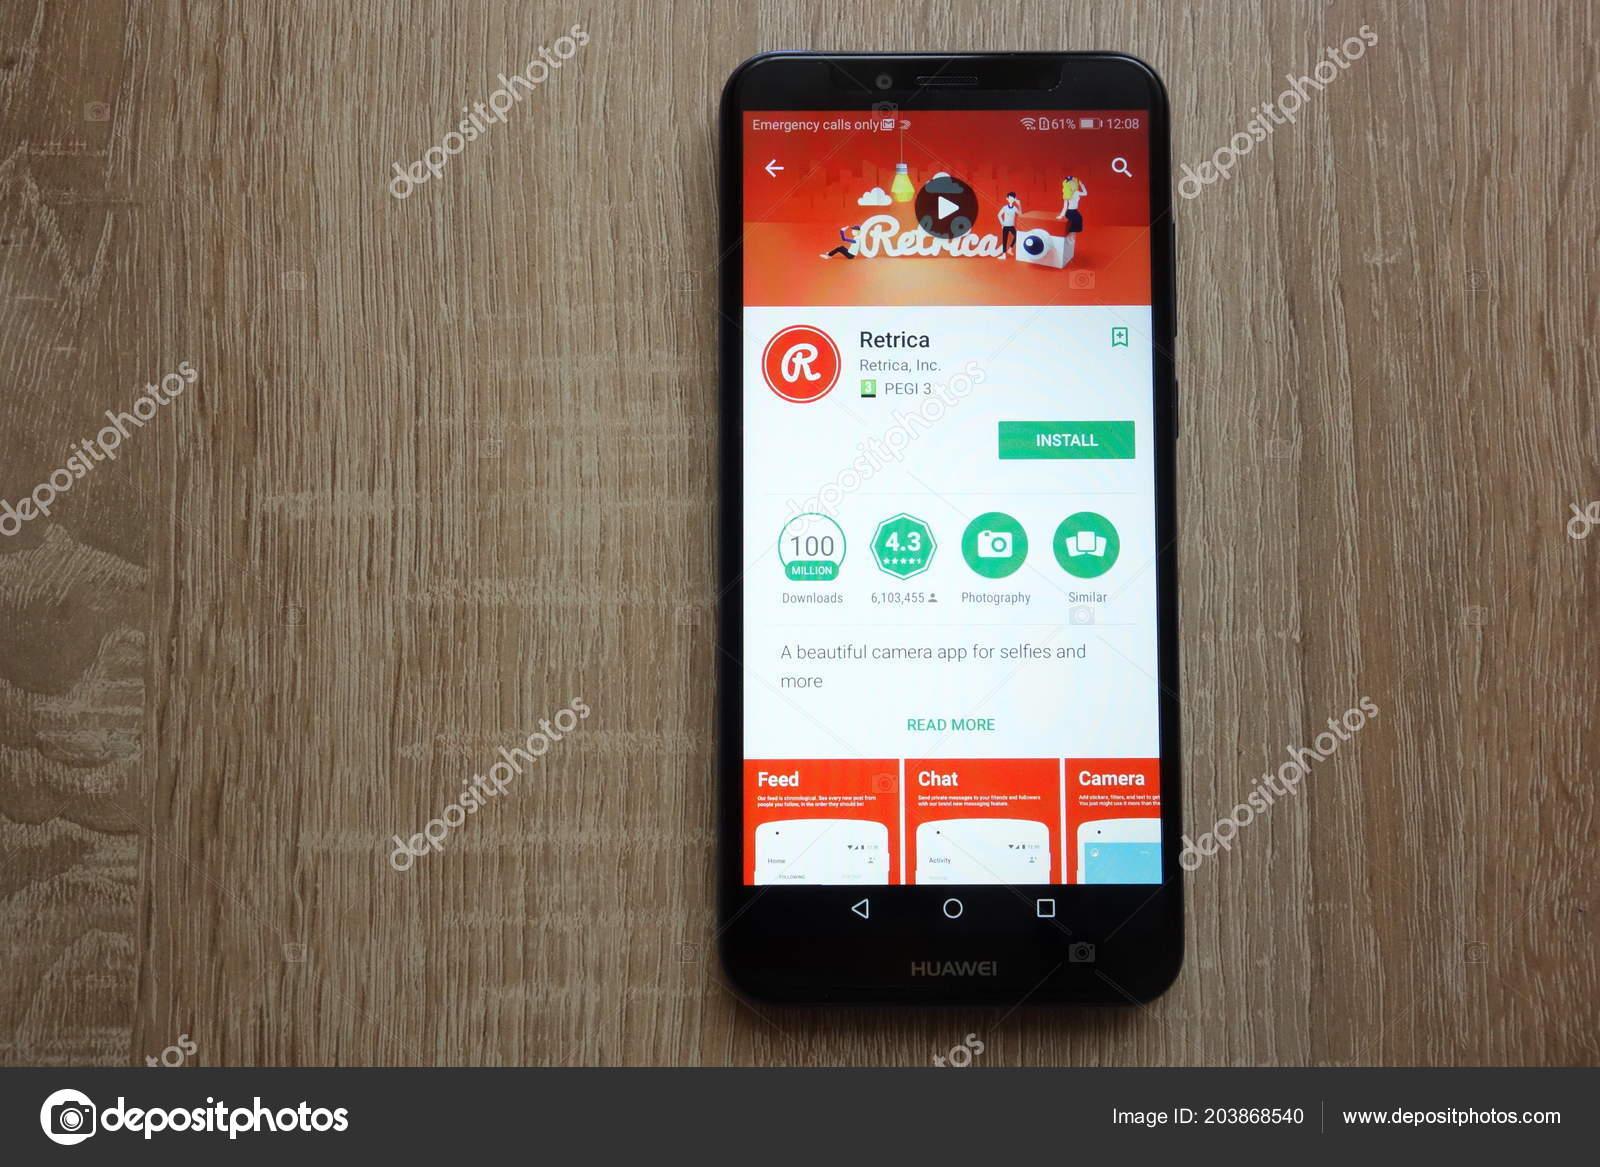 Konskie Poland June 2018 Retrica App Google Play Store Website